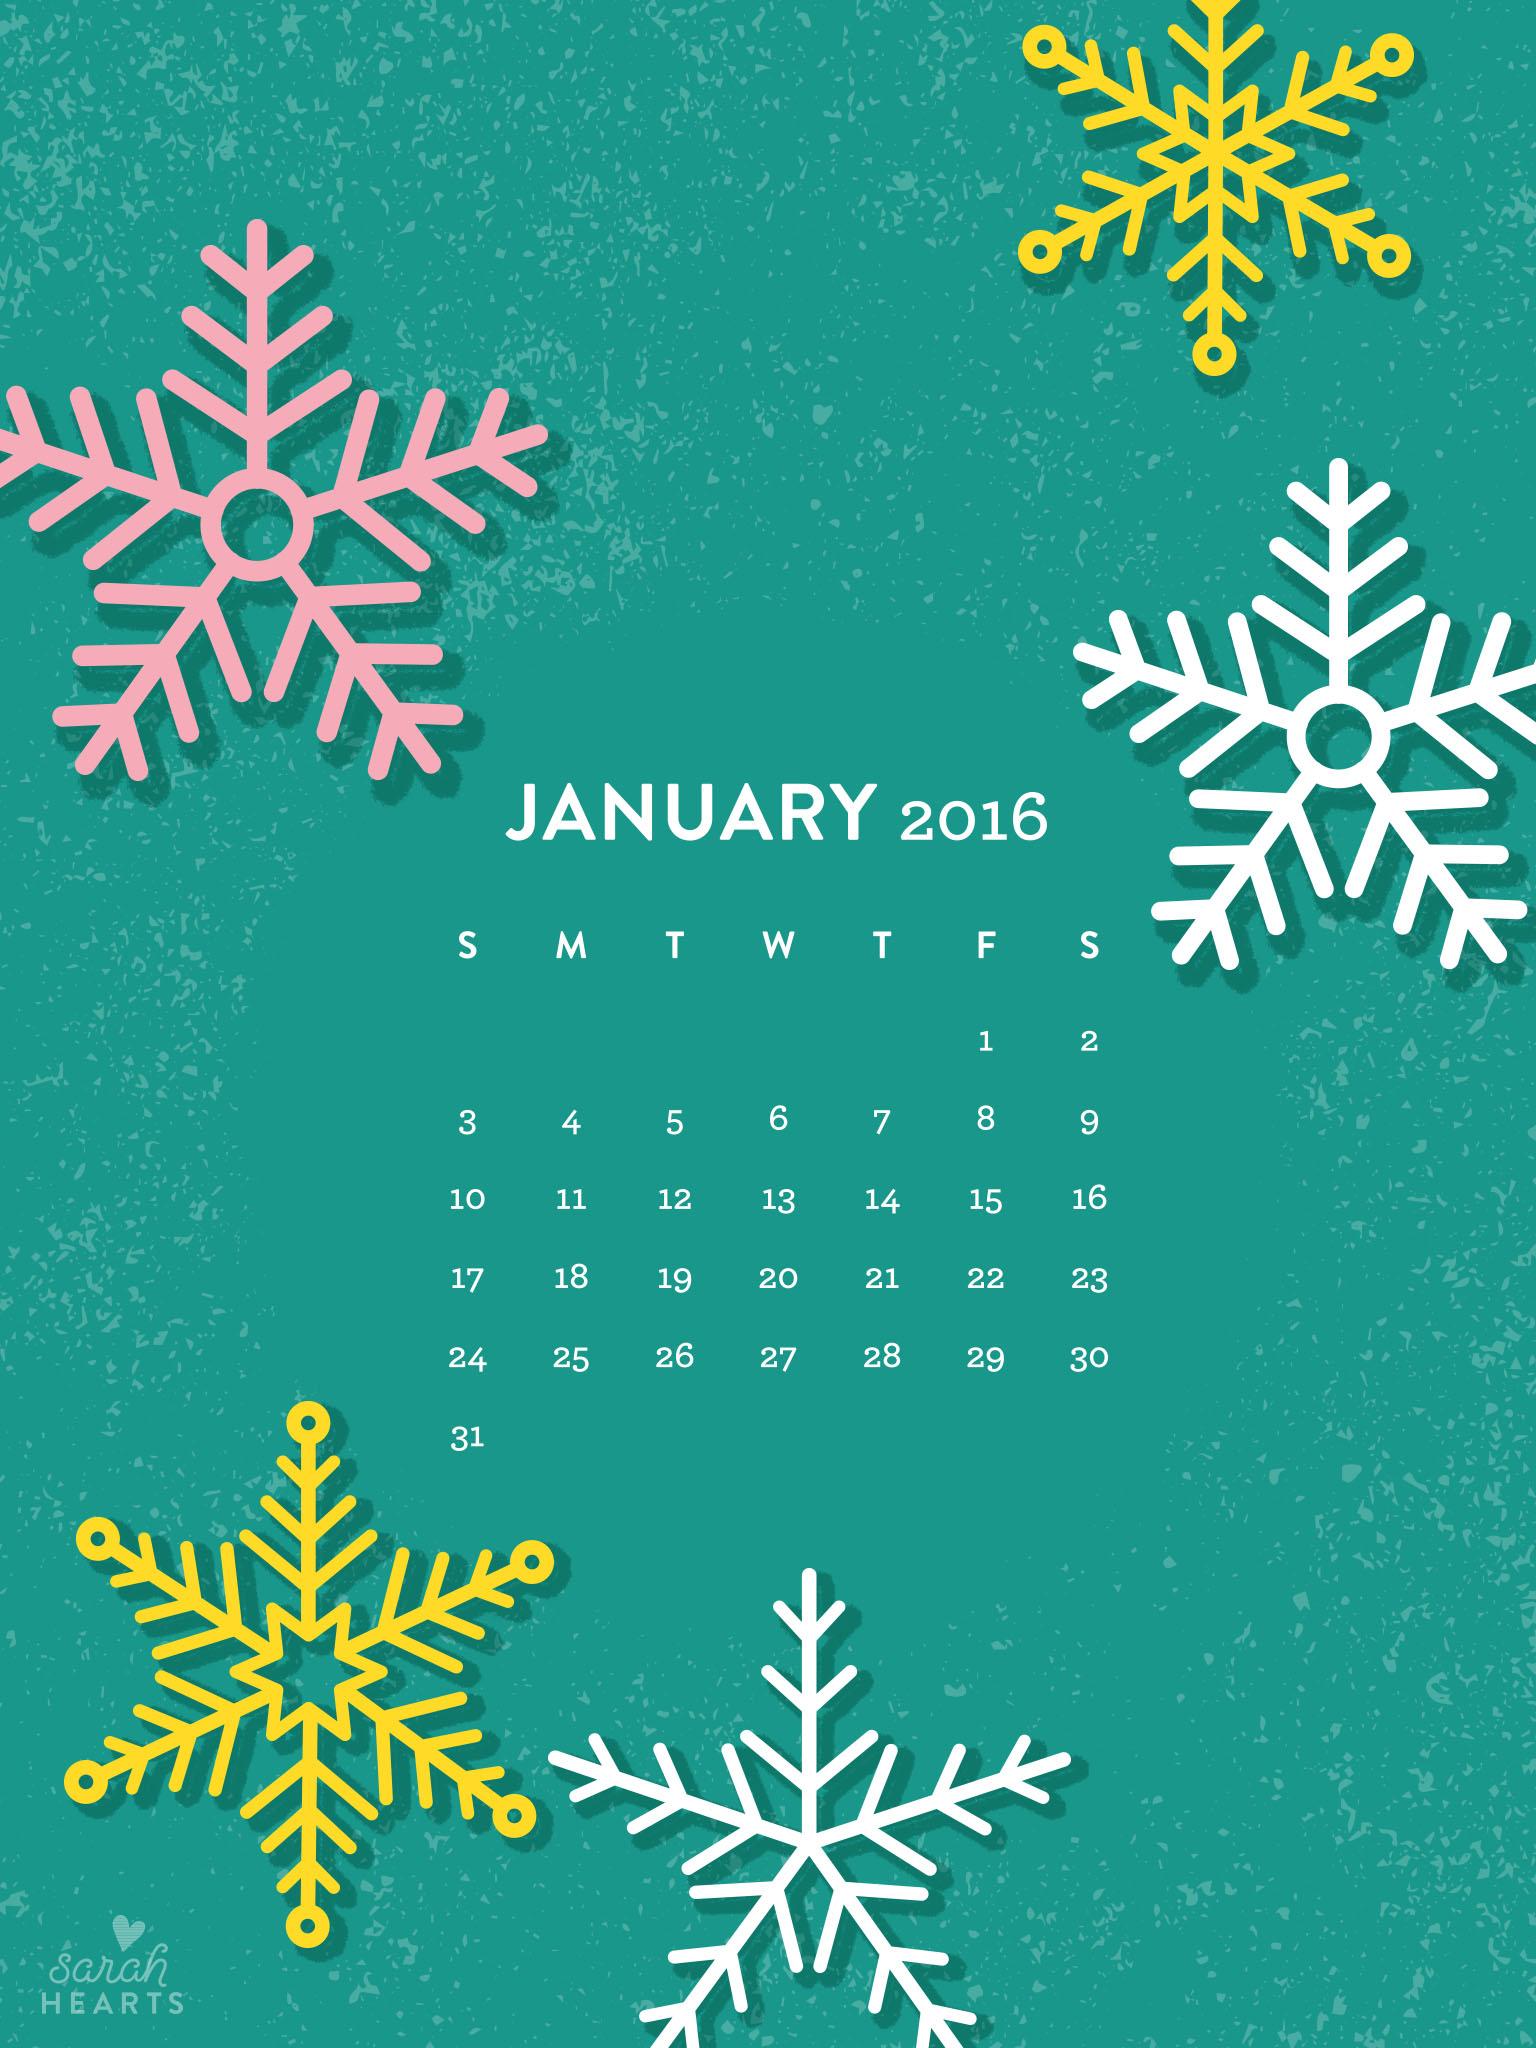 iPad with calendar iPad with quote iPad home screen wallpaper 1536x2048